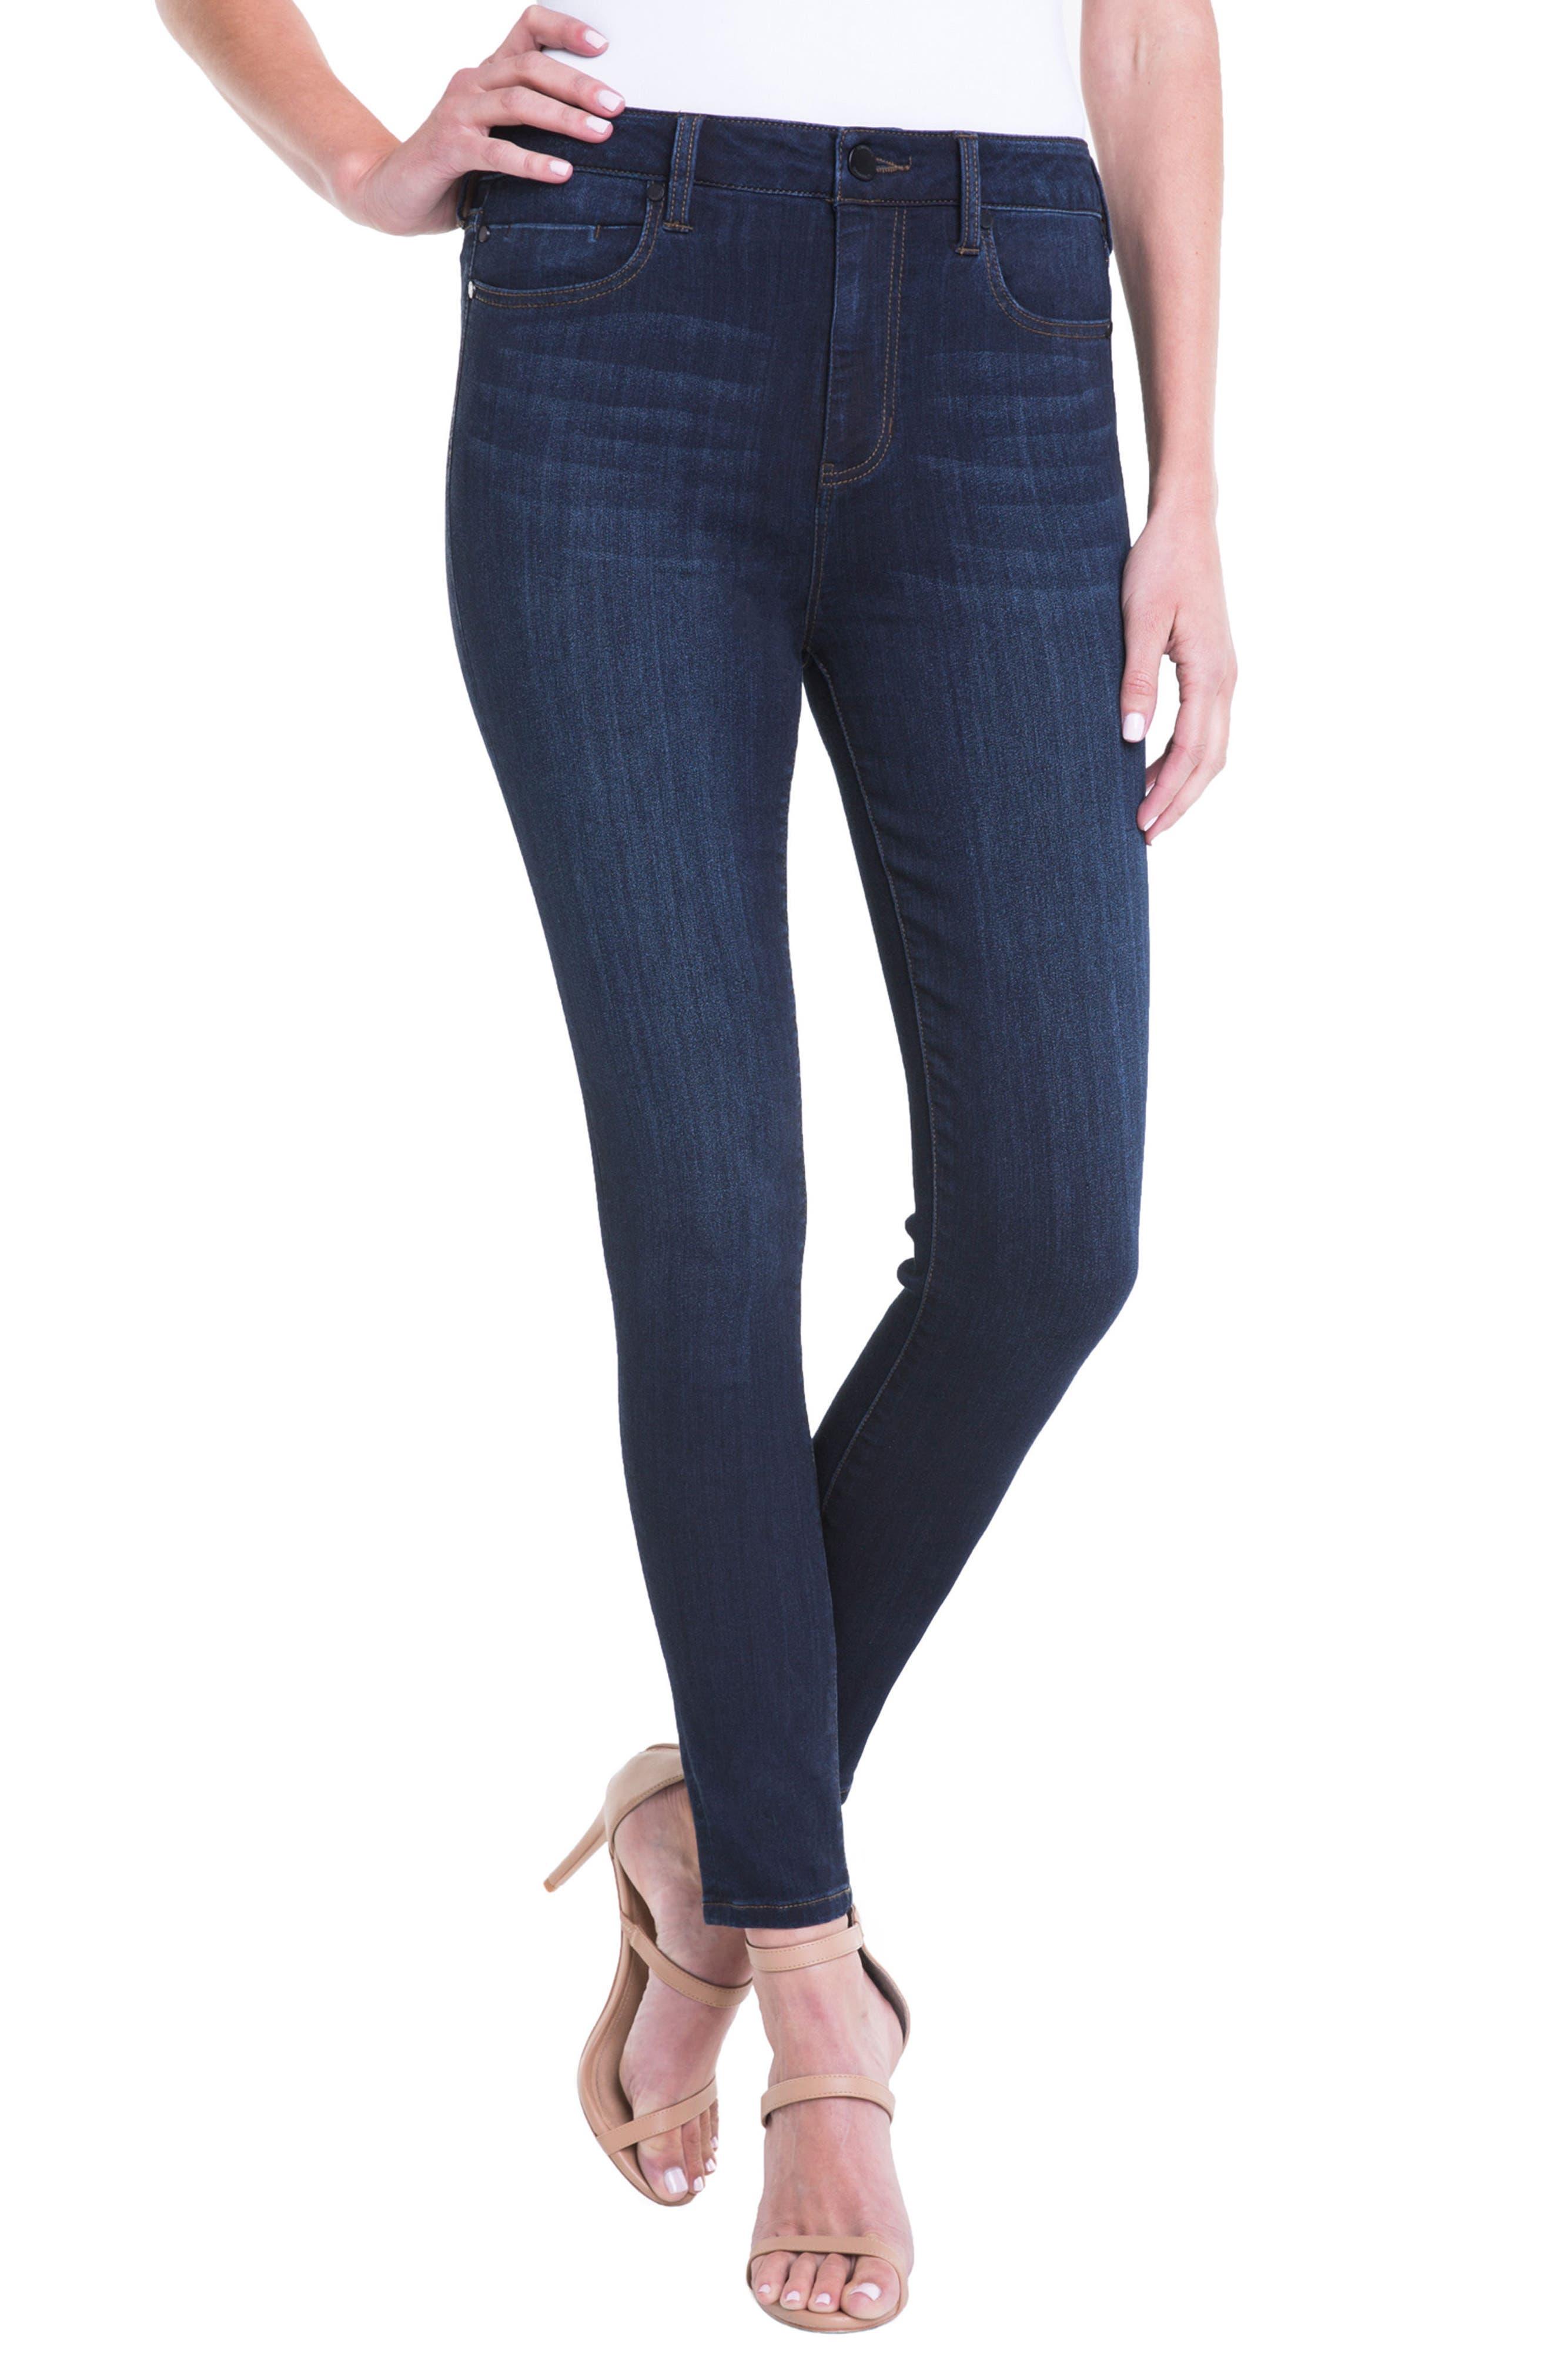 Main Image - Liverpool Jeans Company Bridget High Waist Skinny Jeans